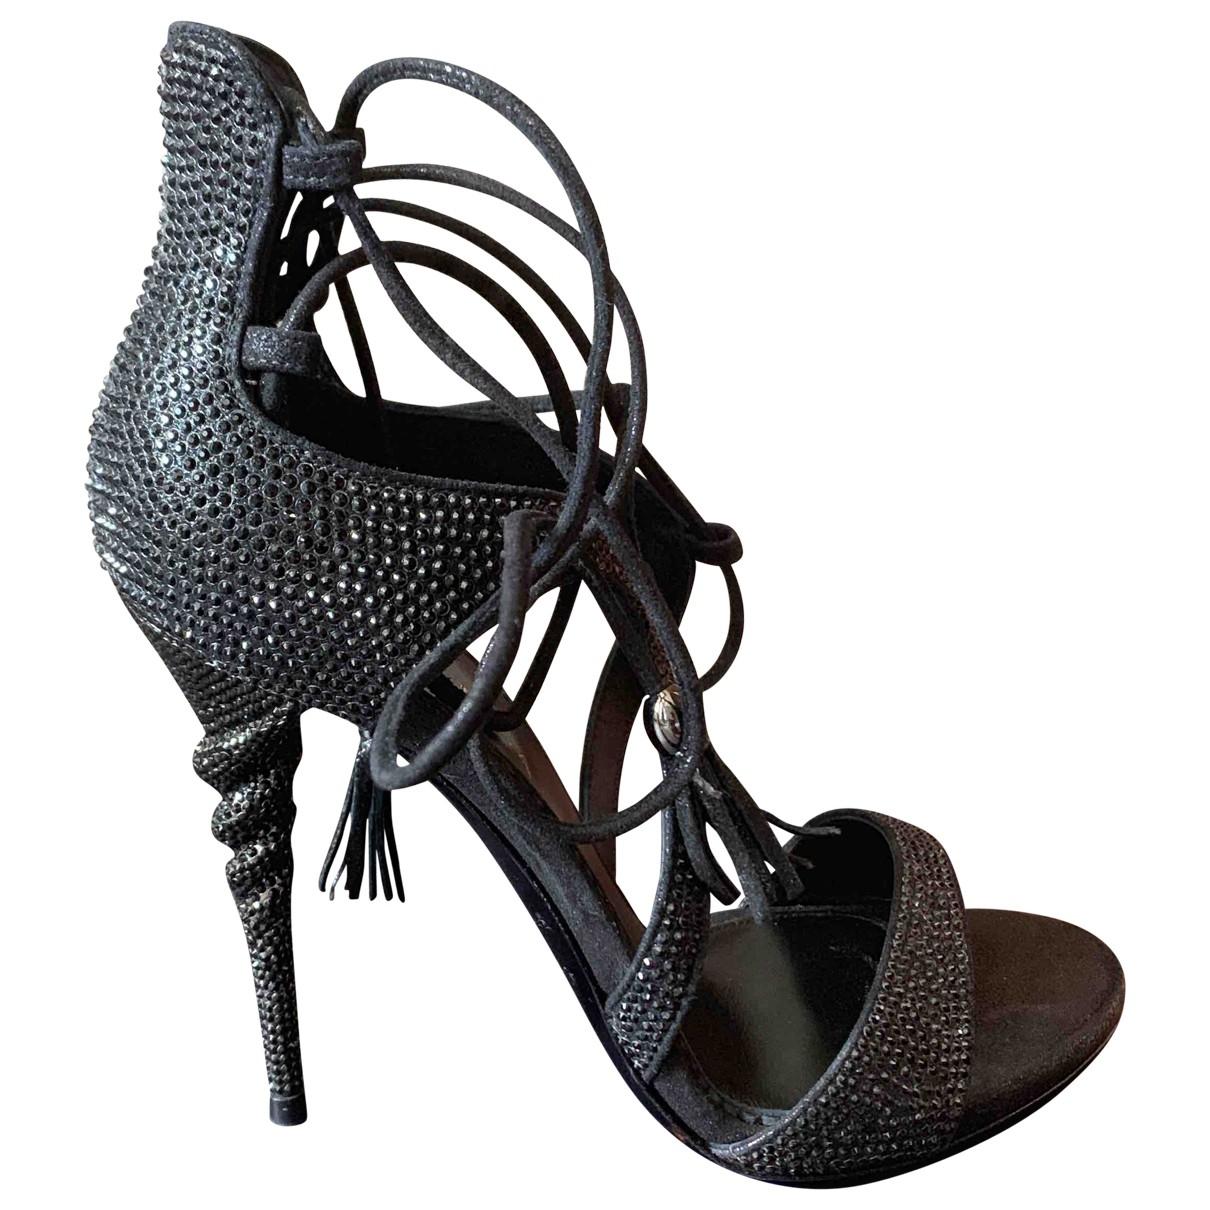 Le Silla \N Black Glitter Sandals for Women 38 EU